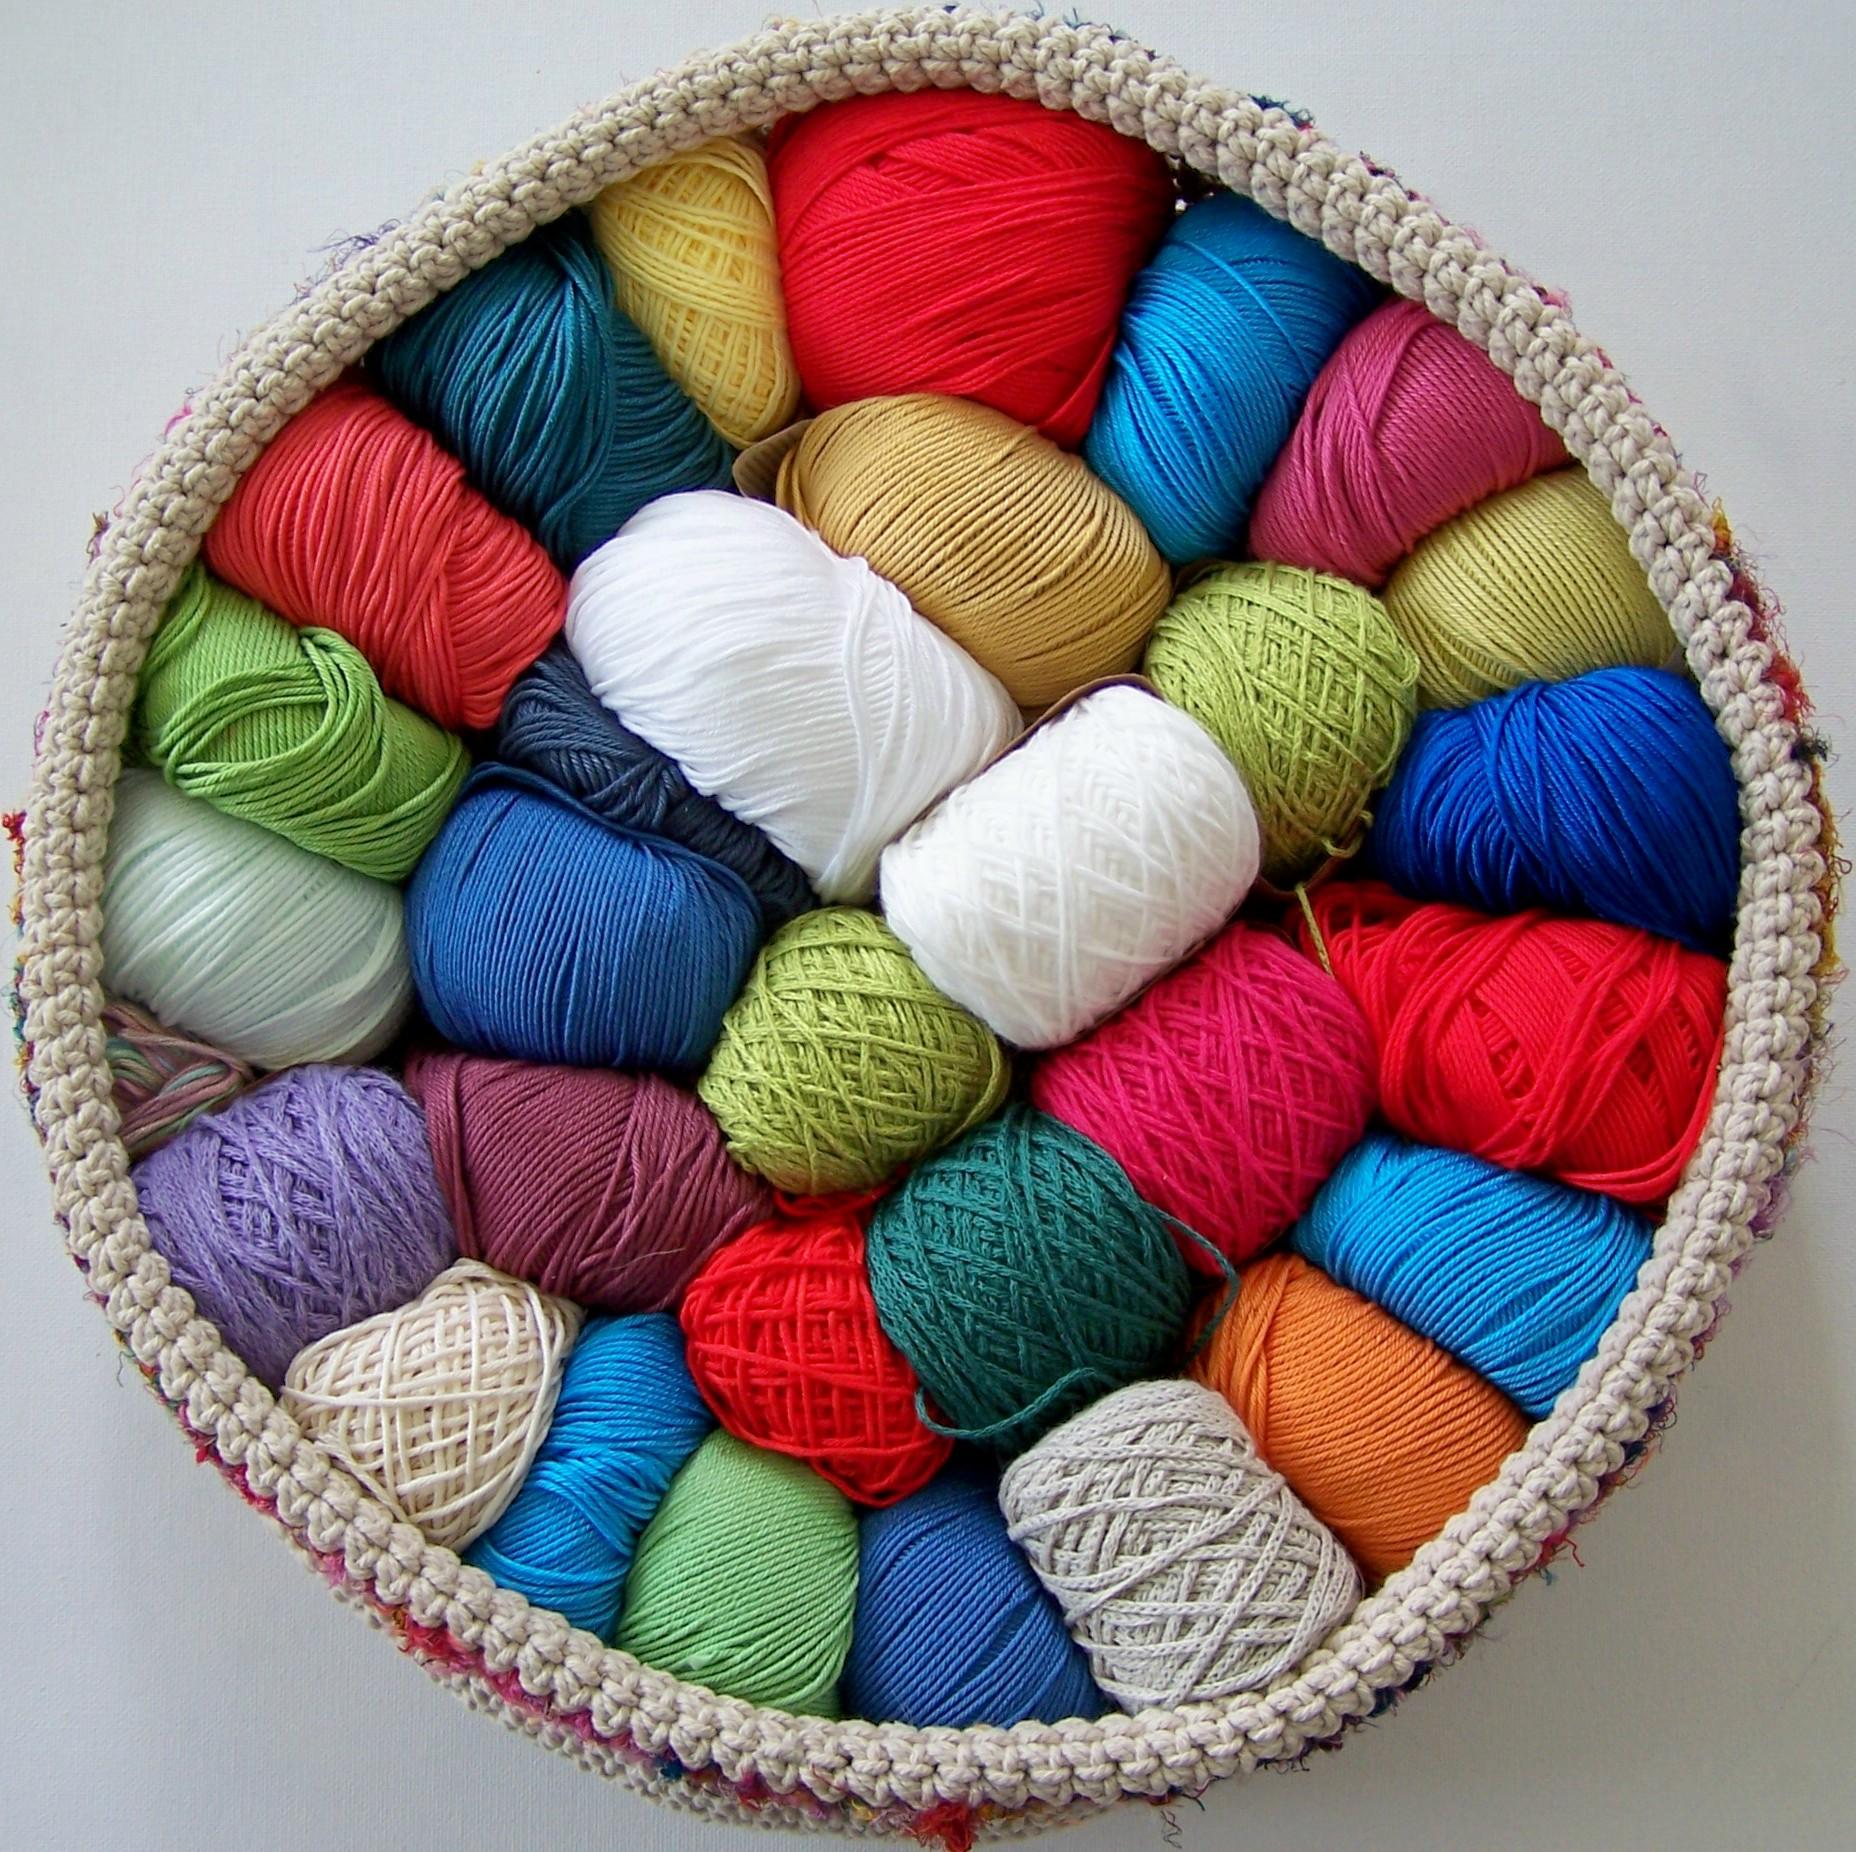 Crochet Patterns Loops And Thread Yarn : Yarn Basket ? Made With Loops